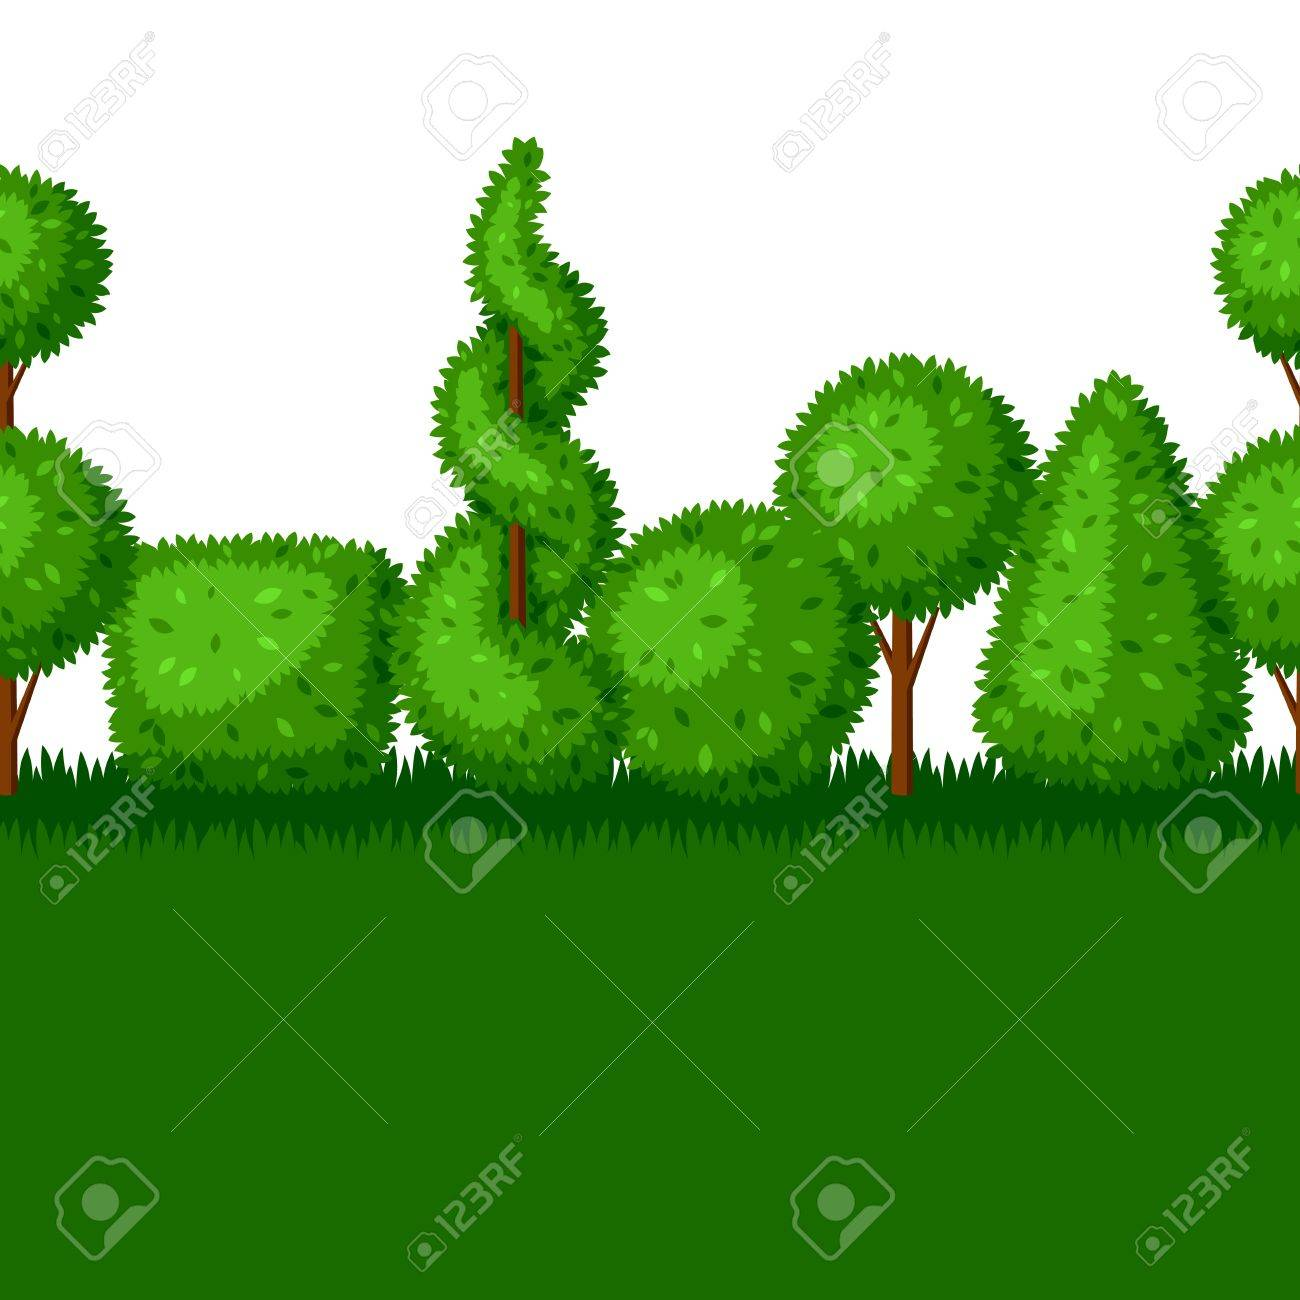 Boxwood Topiary Garden Plants. Seamless Border With Decorative ...